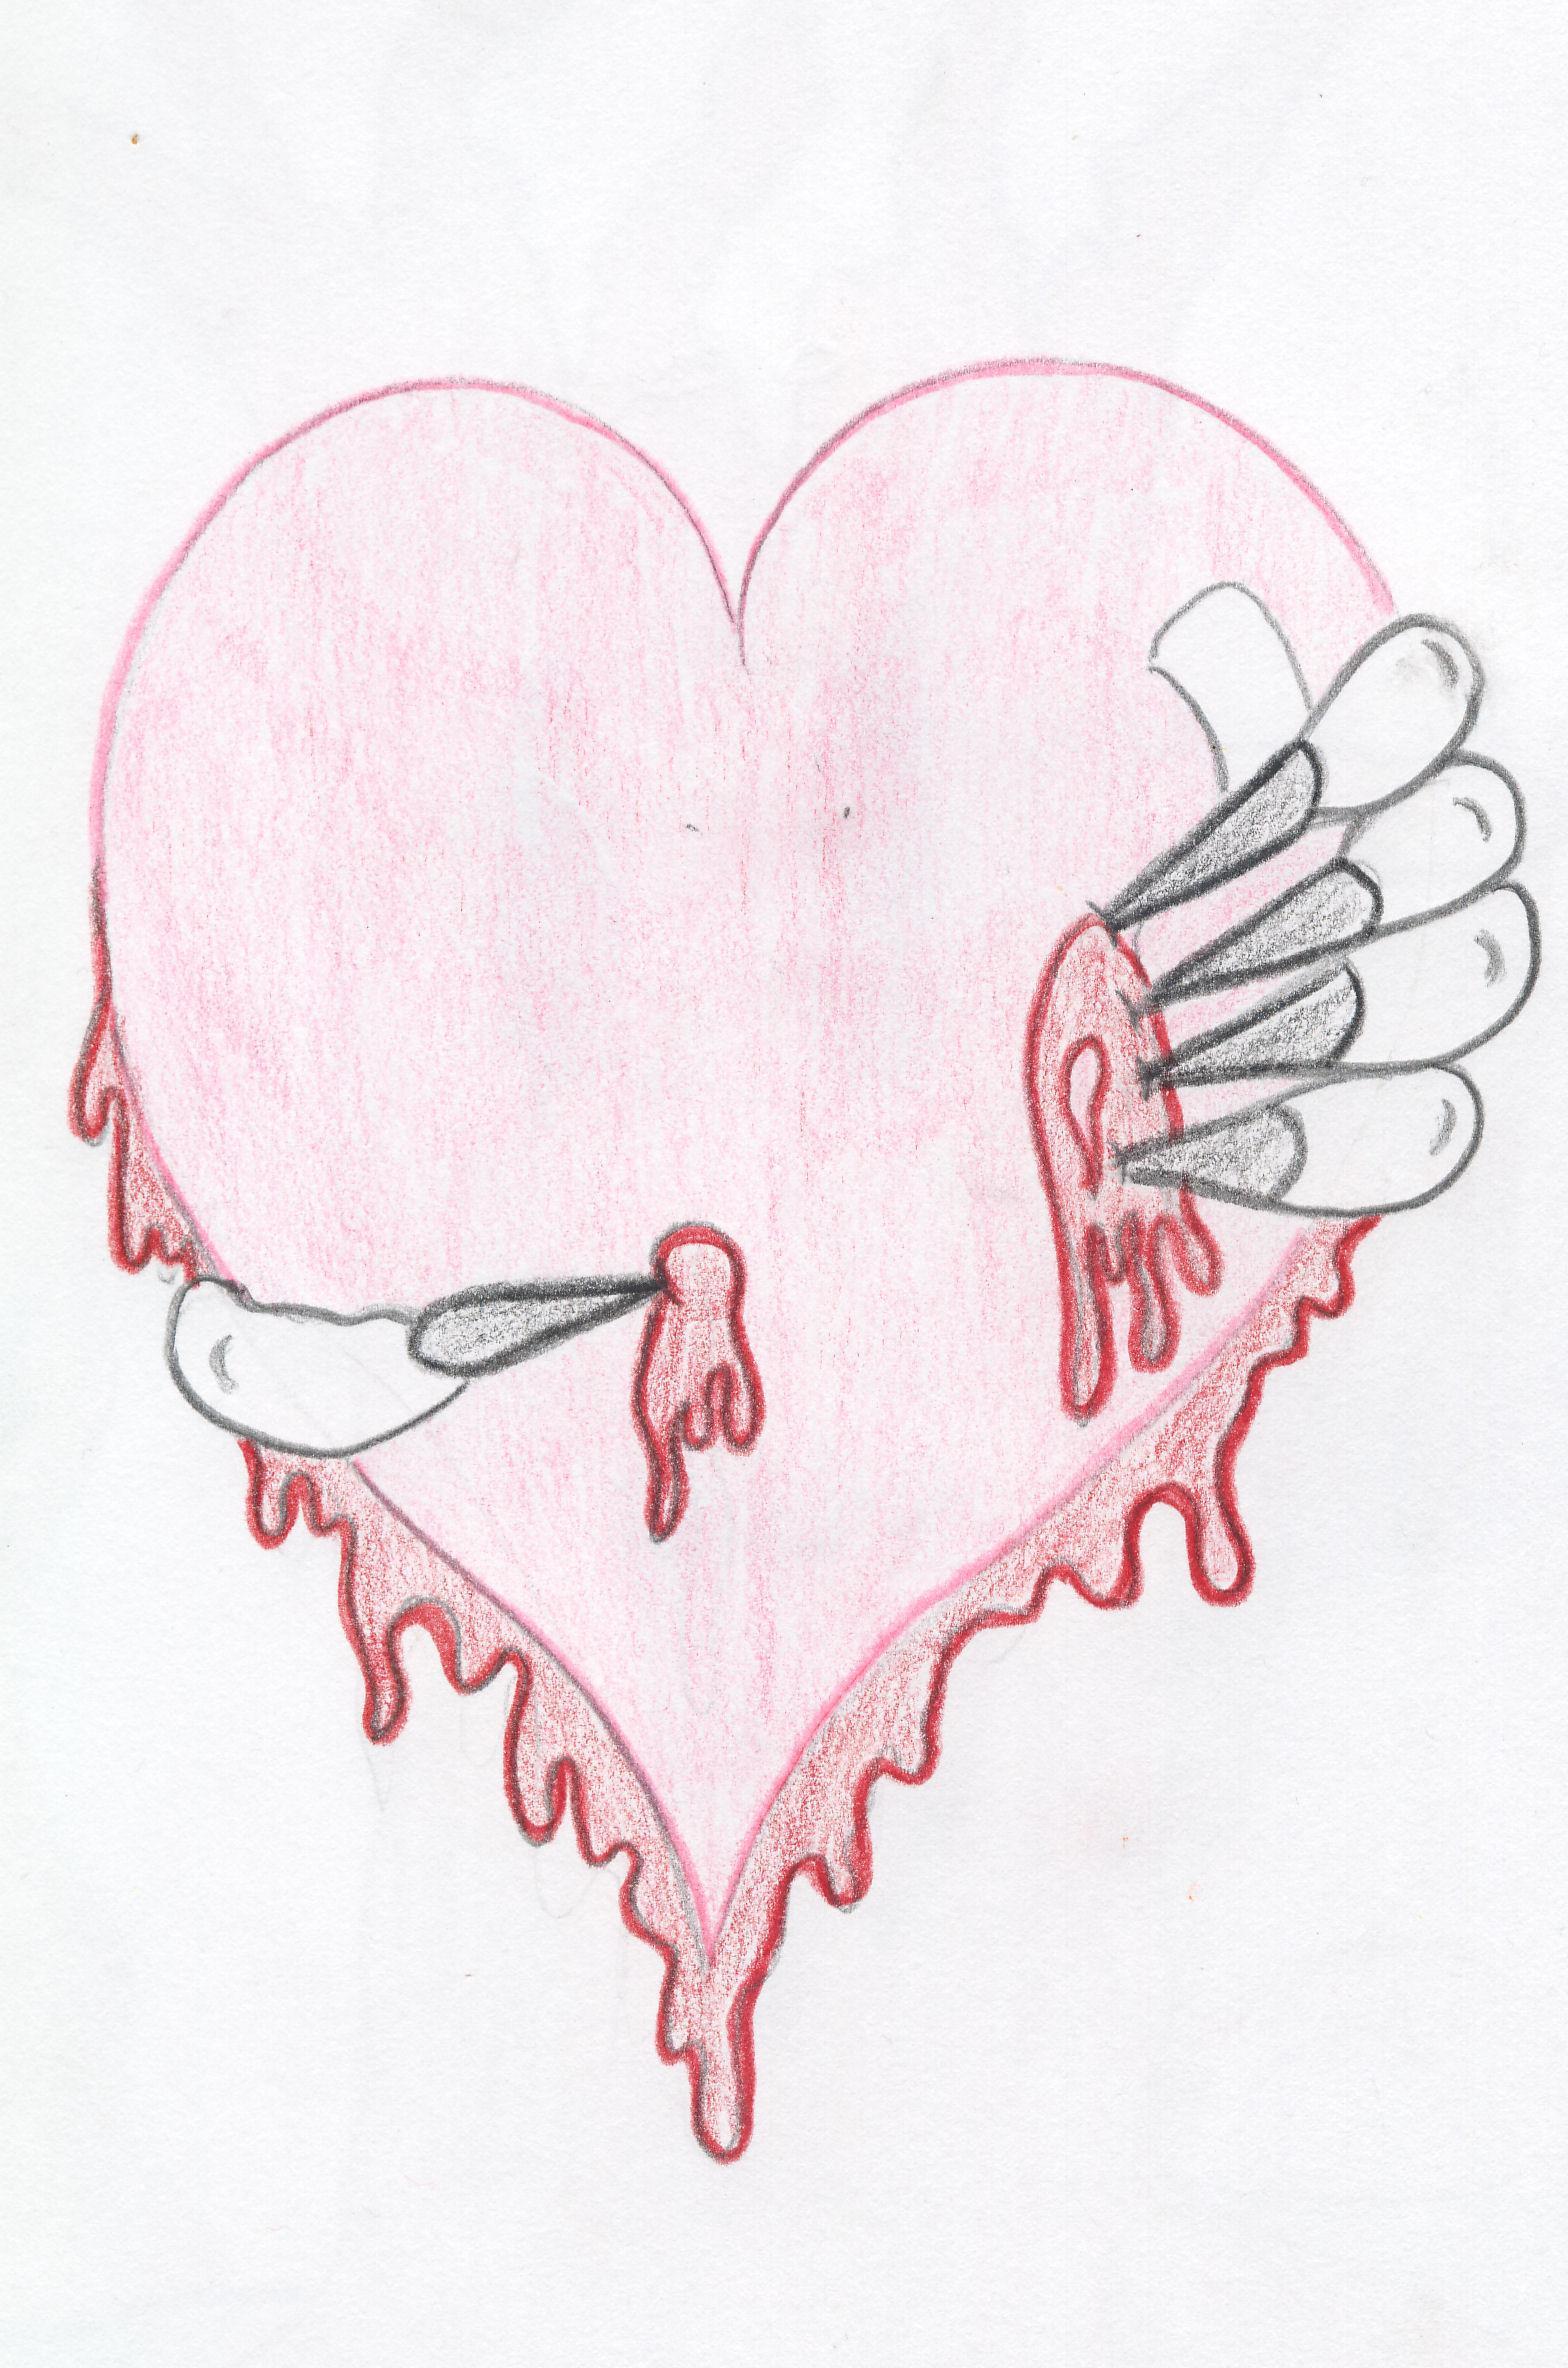 Bleeding Heart Sketch Bleeding Heart by